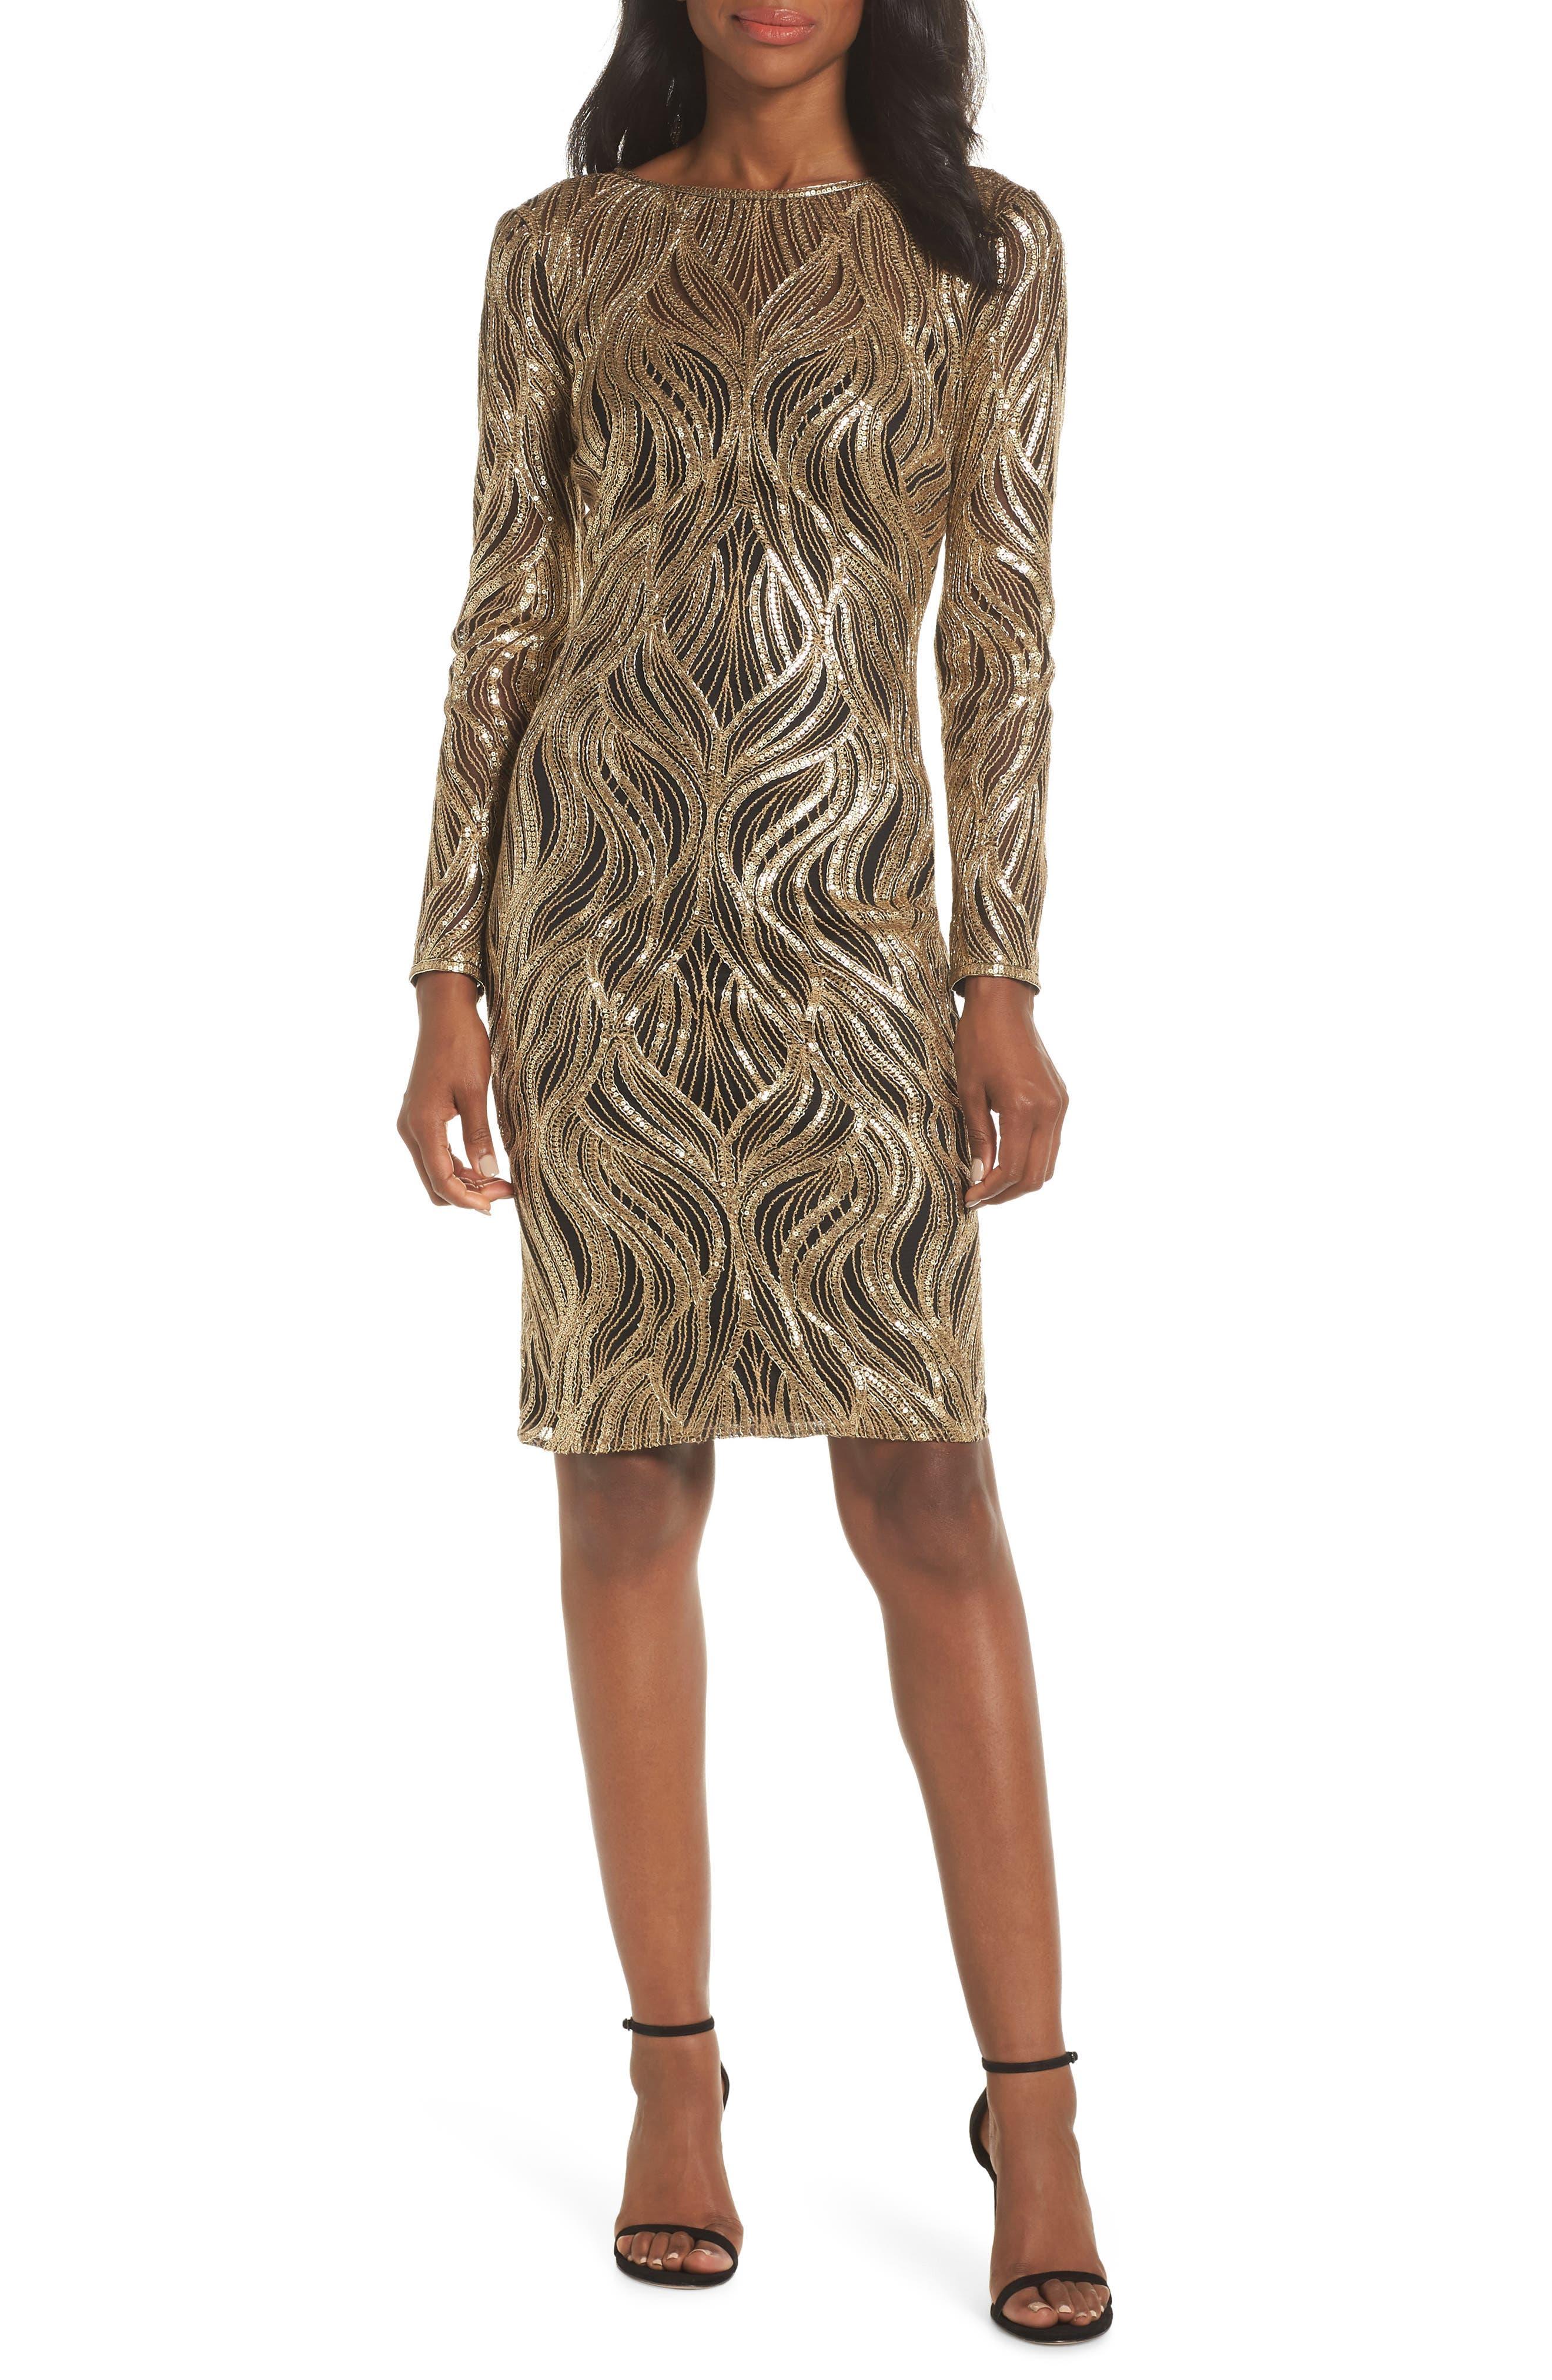 TADASHI SHOJI, Long Sleeve Sequin Mesh Cocktail Dress, Main thumbnail 1, color, GOLD/ BLACK